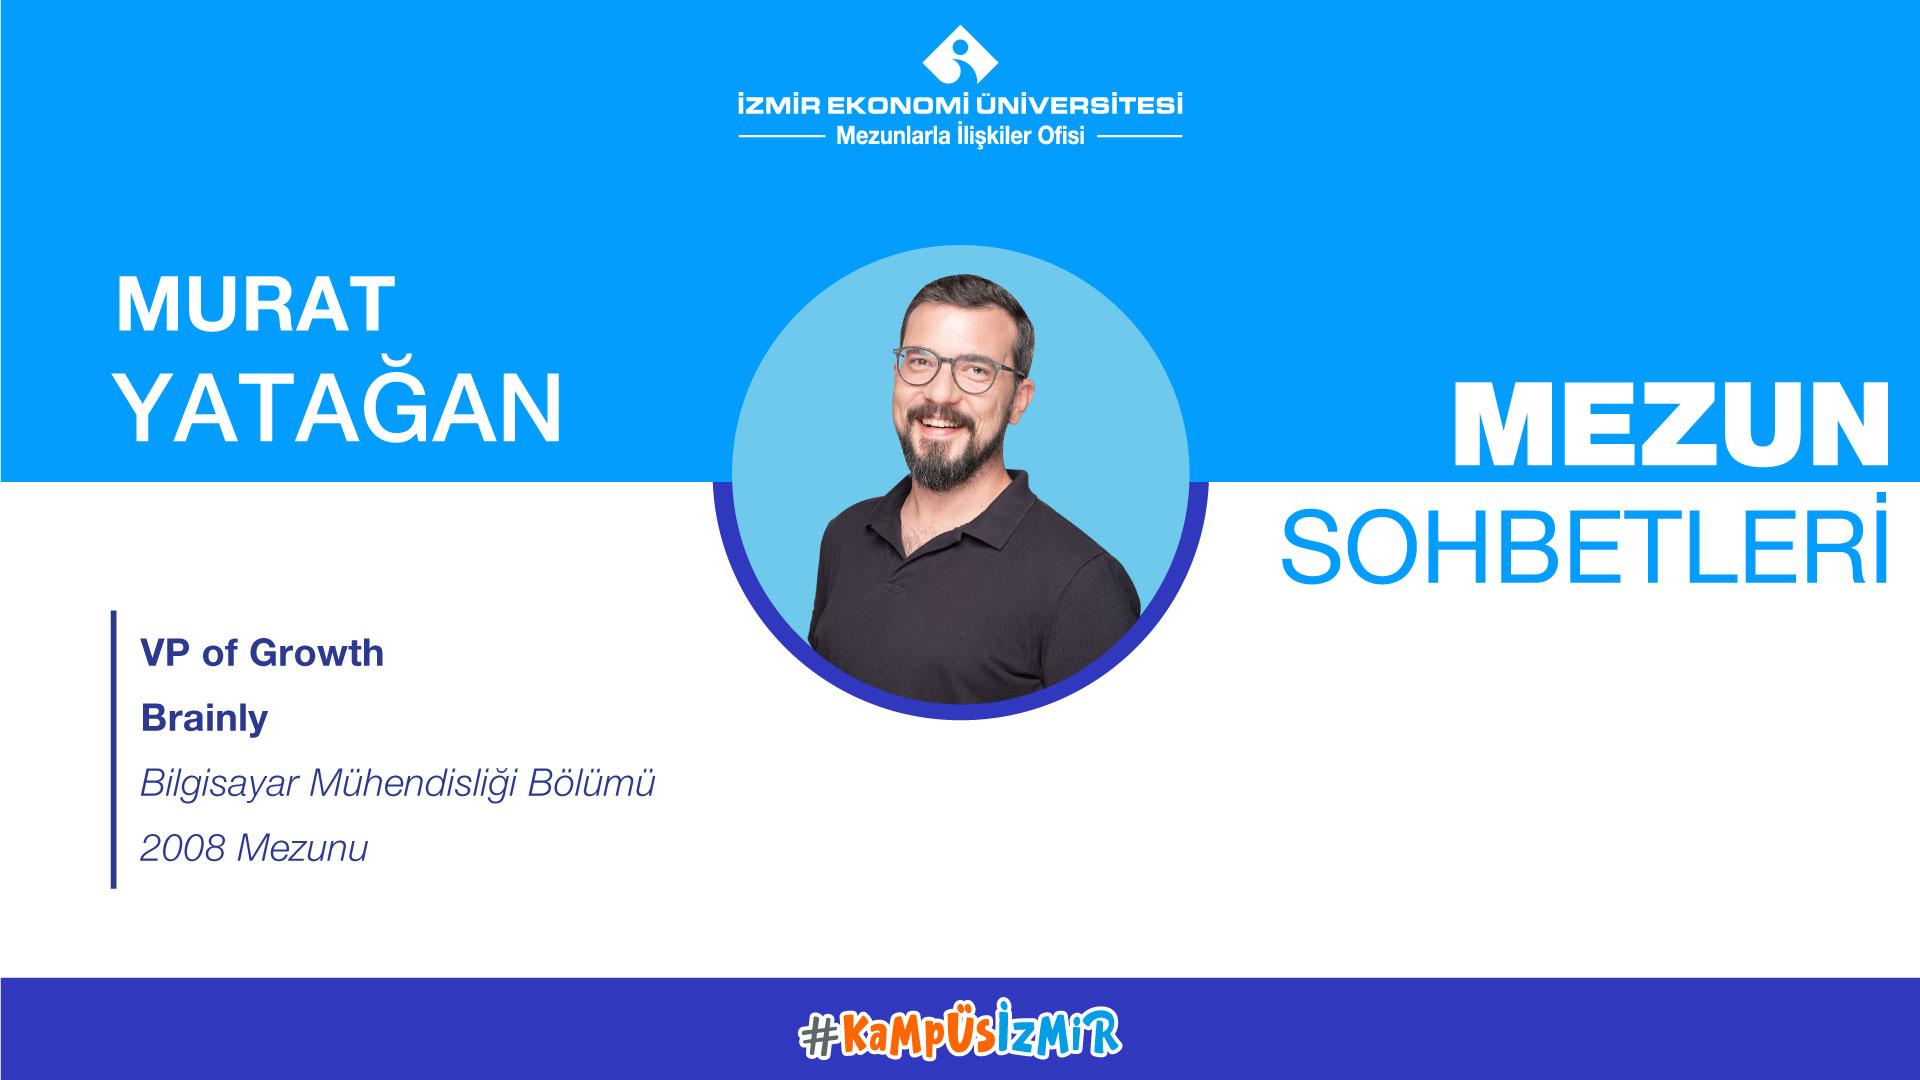 Online alumni chats-Murat Yatağan